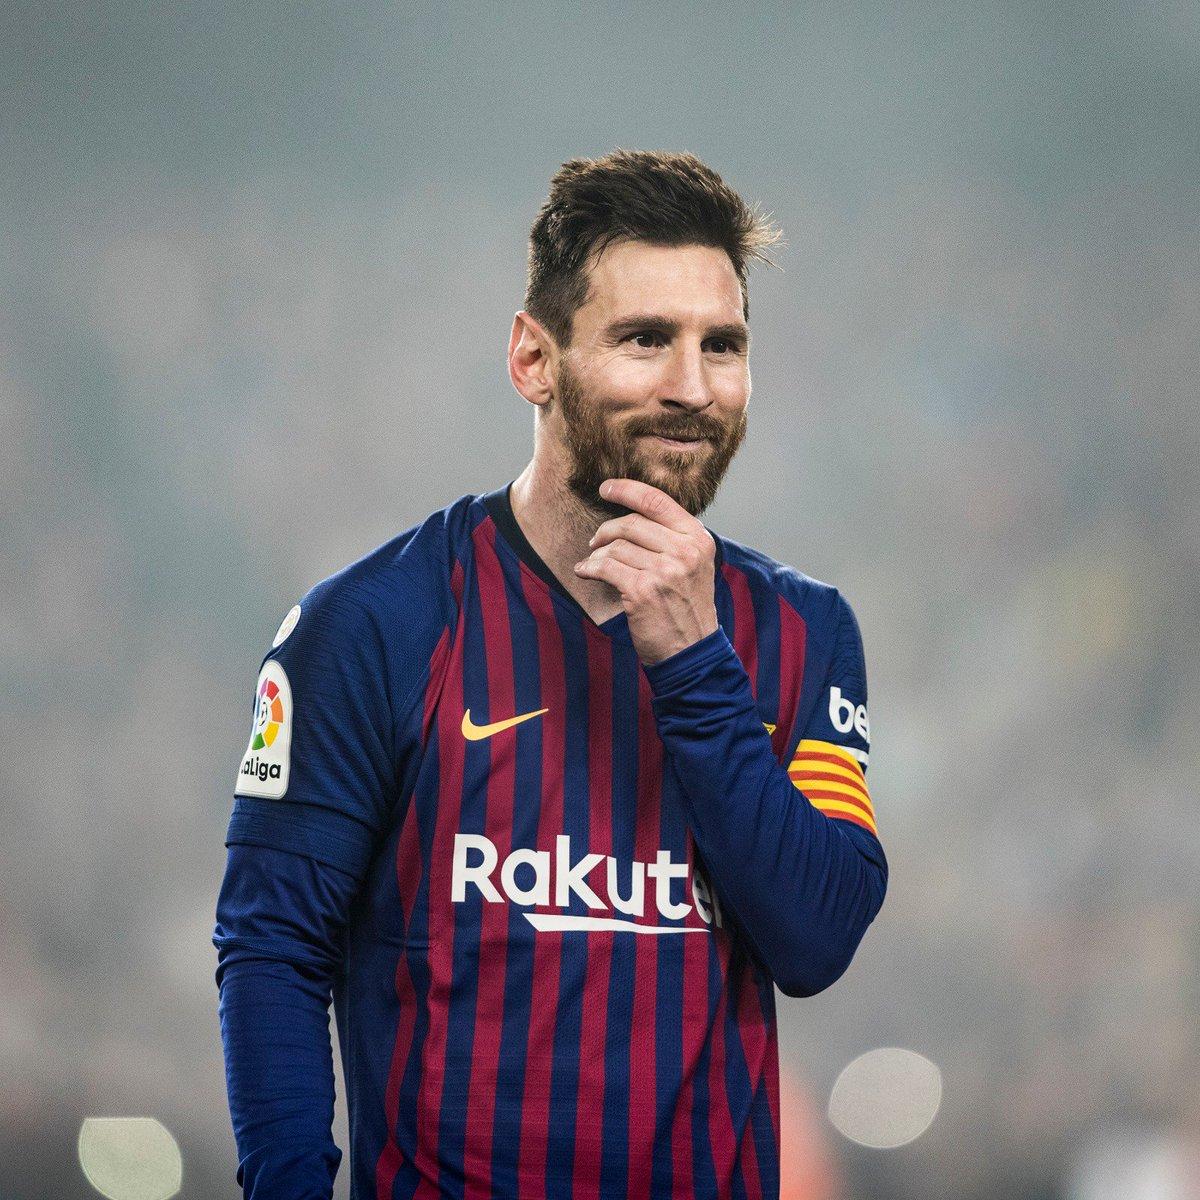 Barça Universal on Twitter: